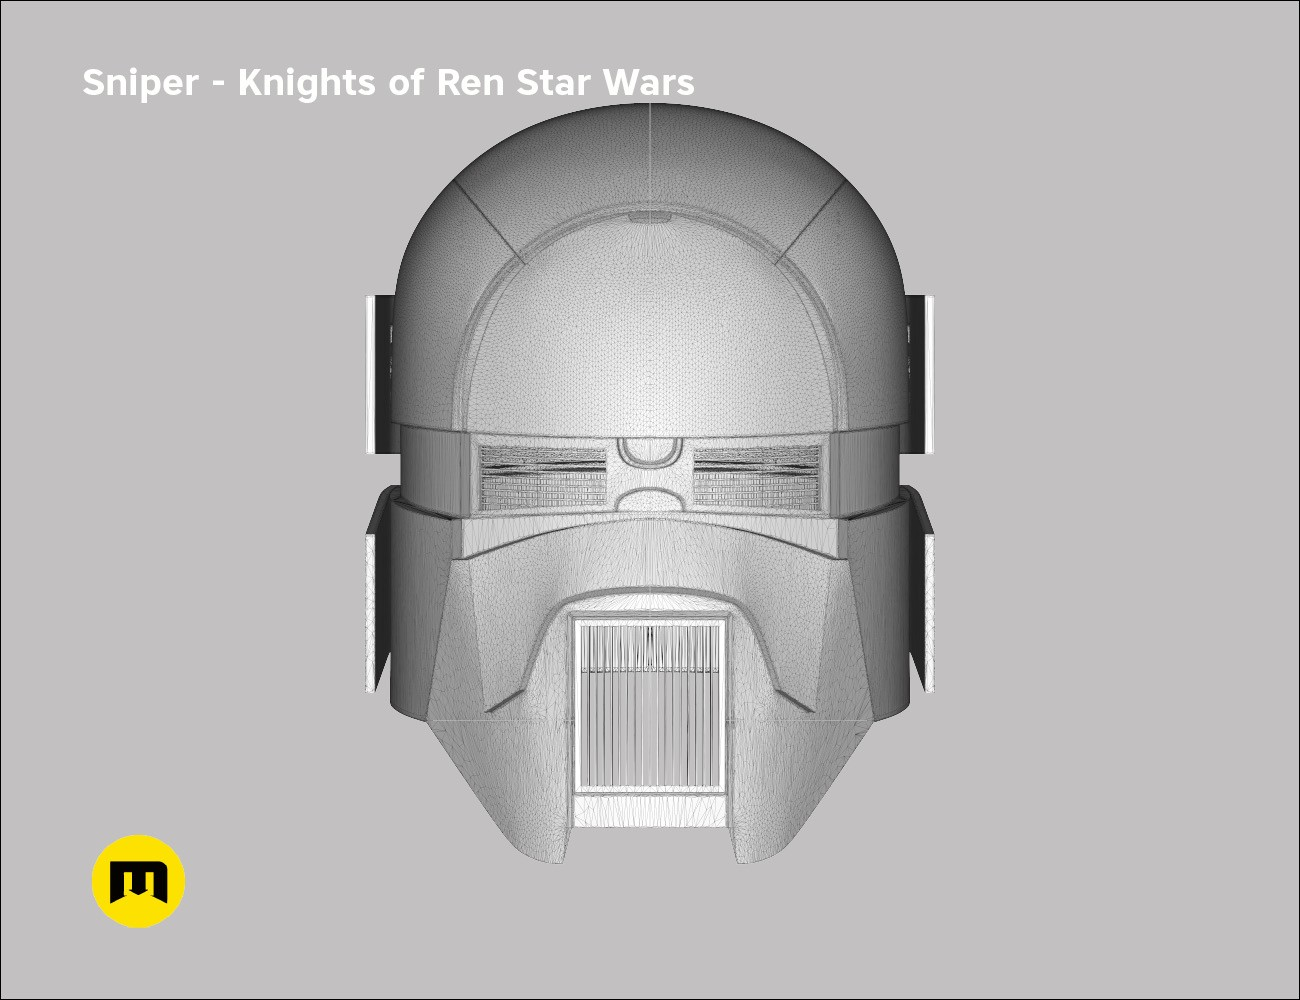 Sniper Helmet Knights Of Ren Star Wars Universe